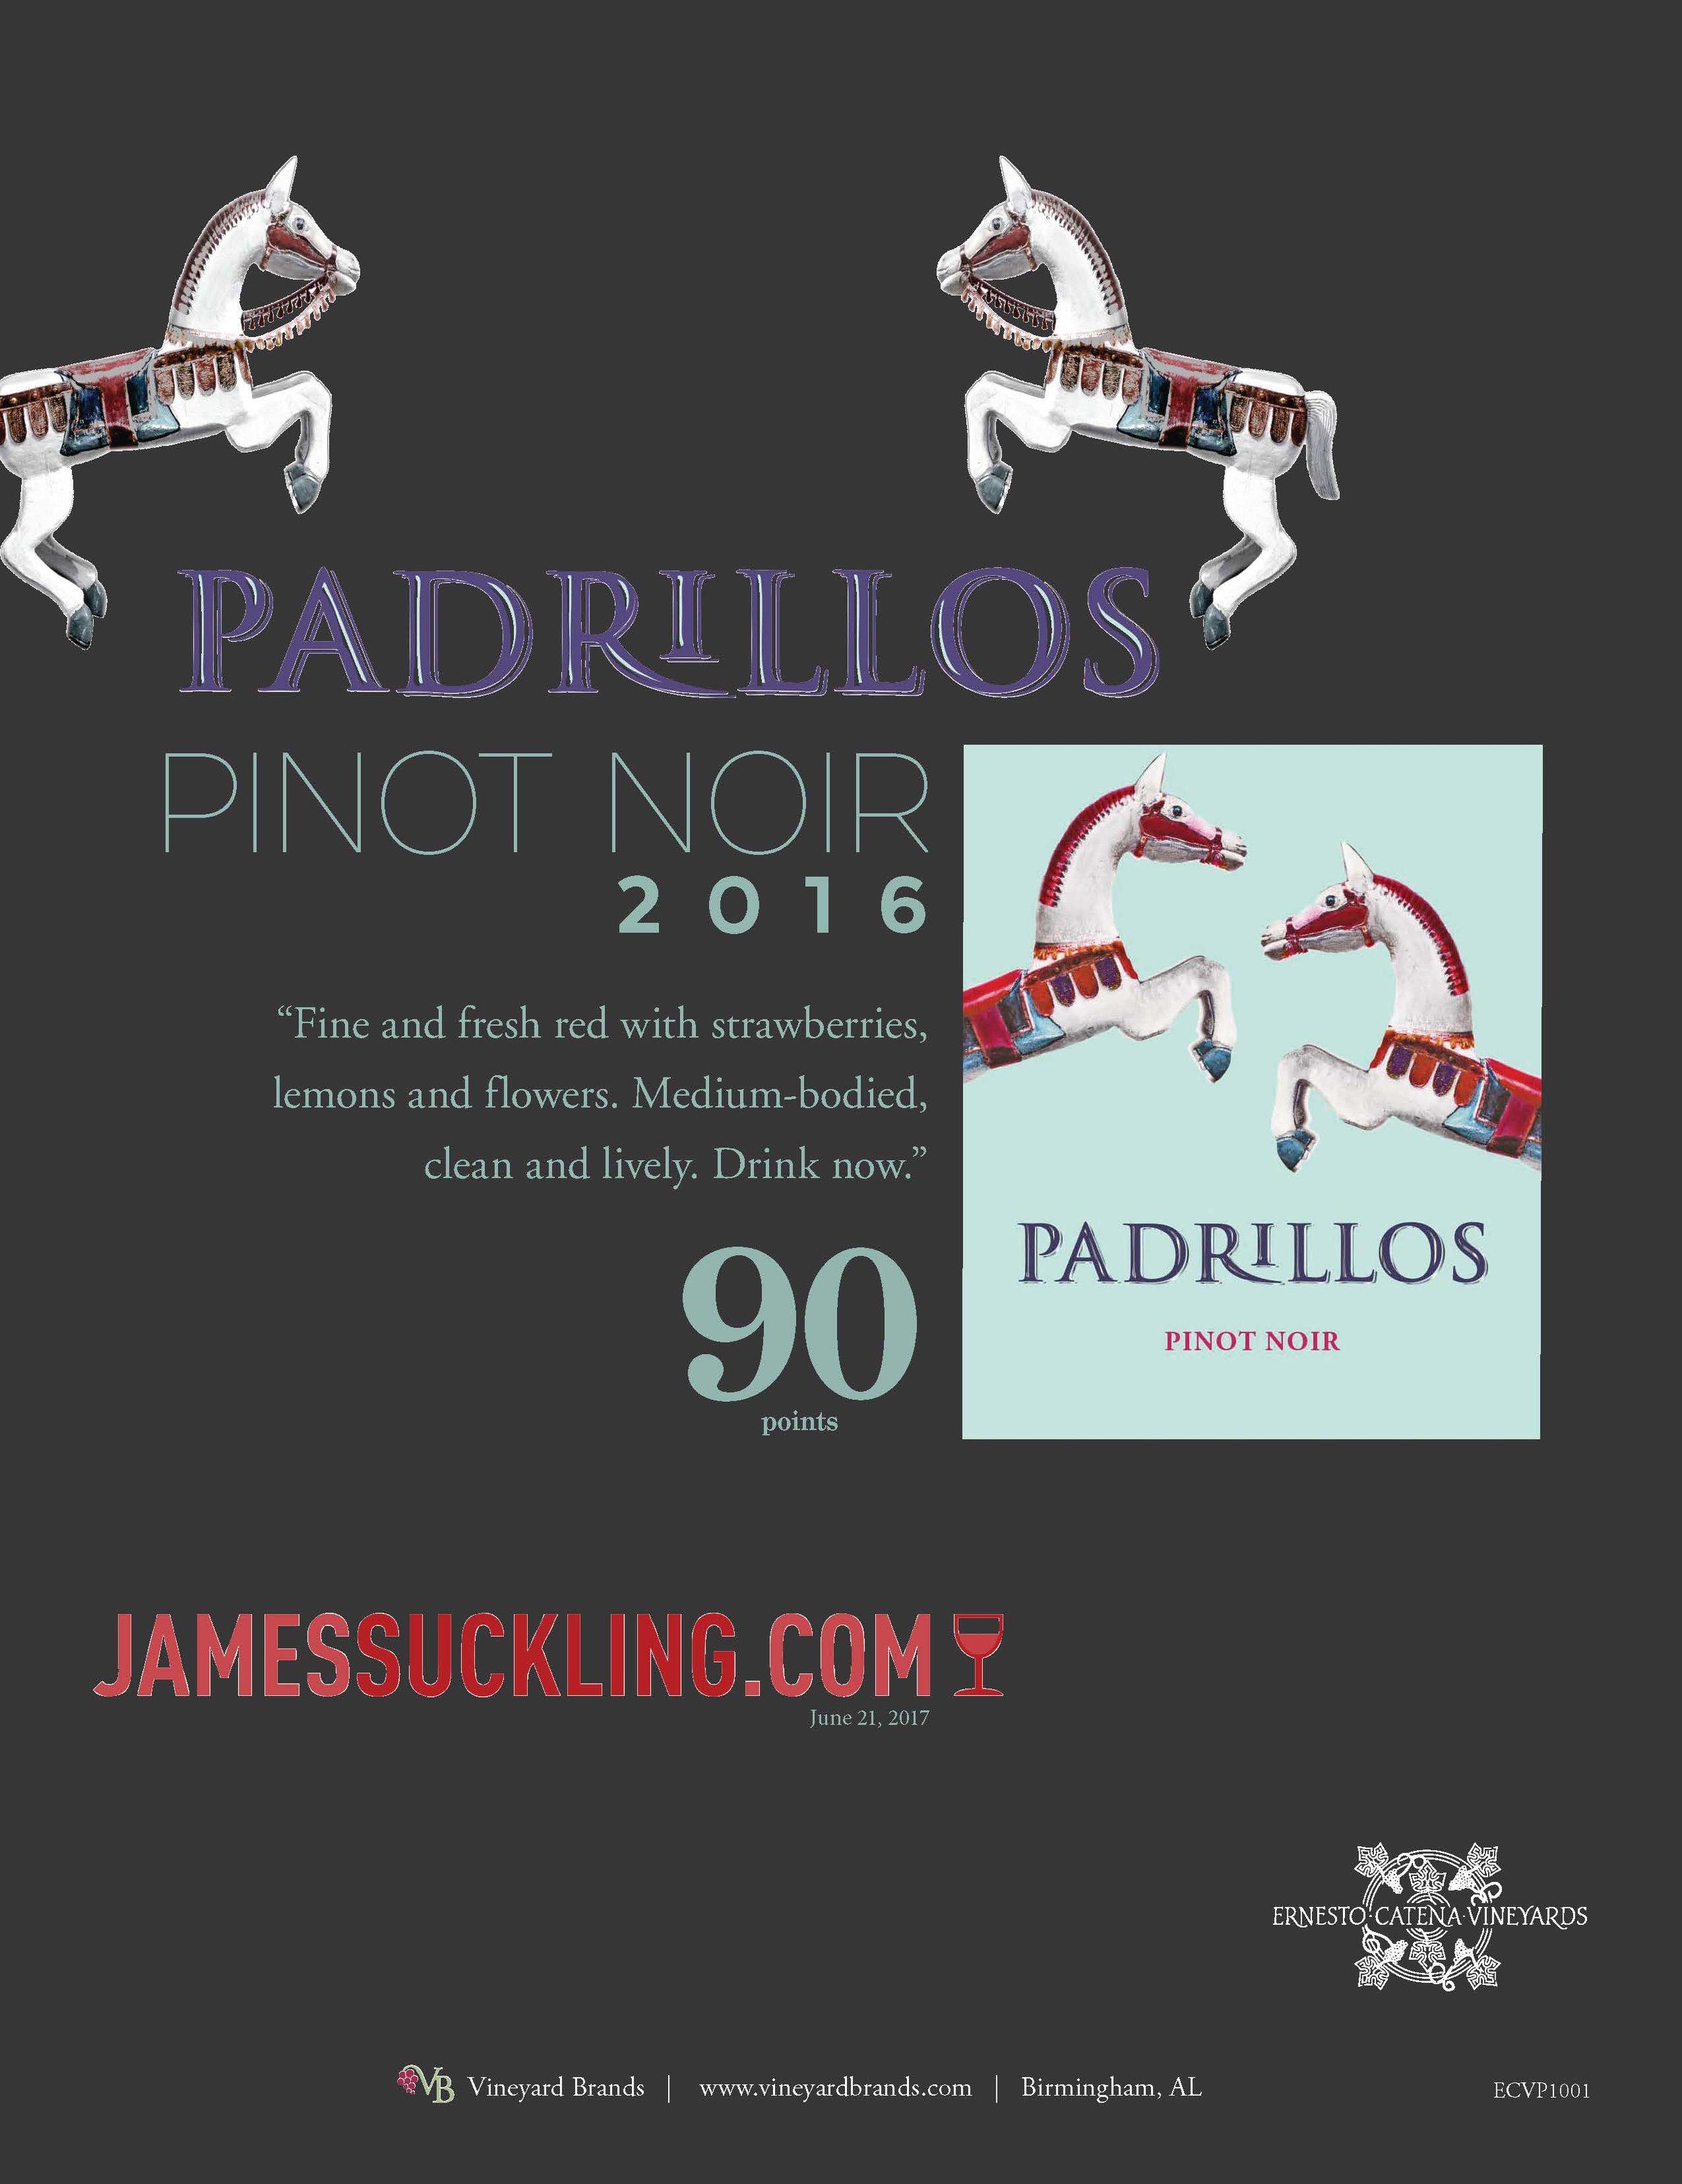 Padrillos Pinot Noir 2016.jpg